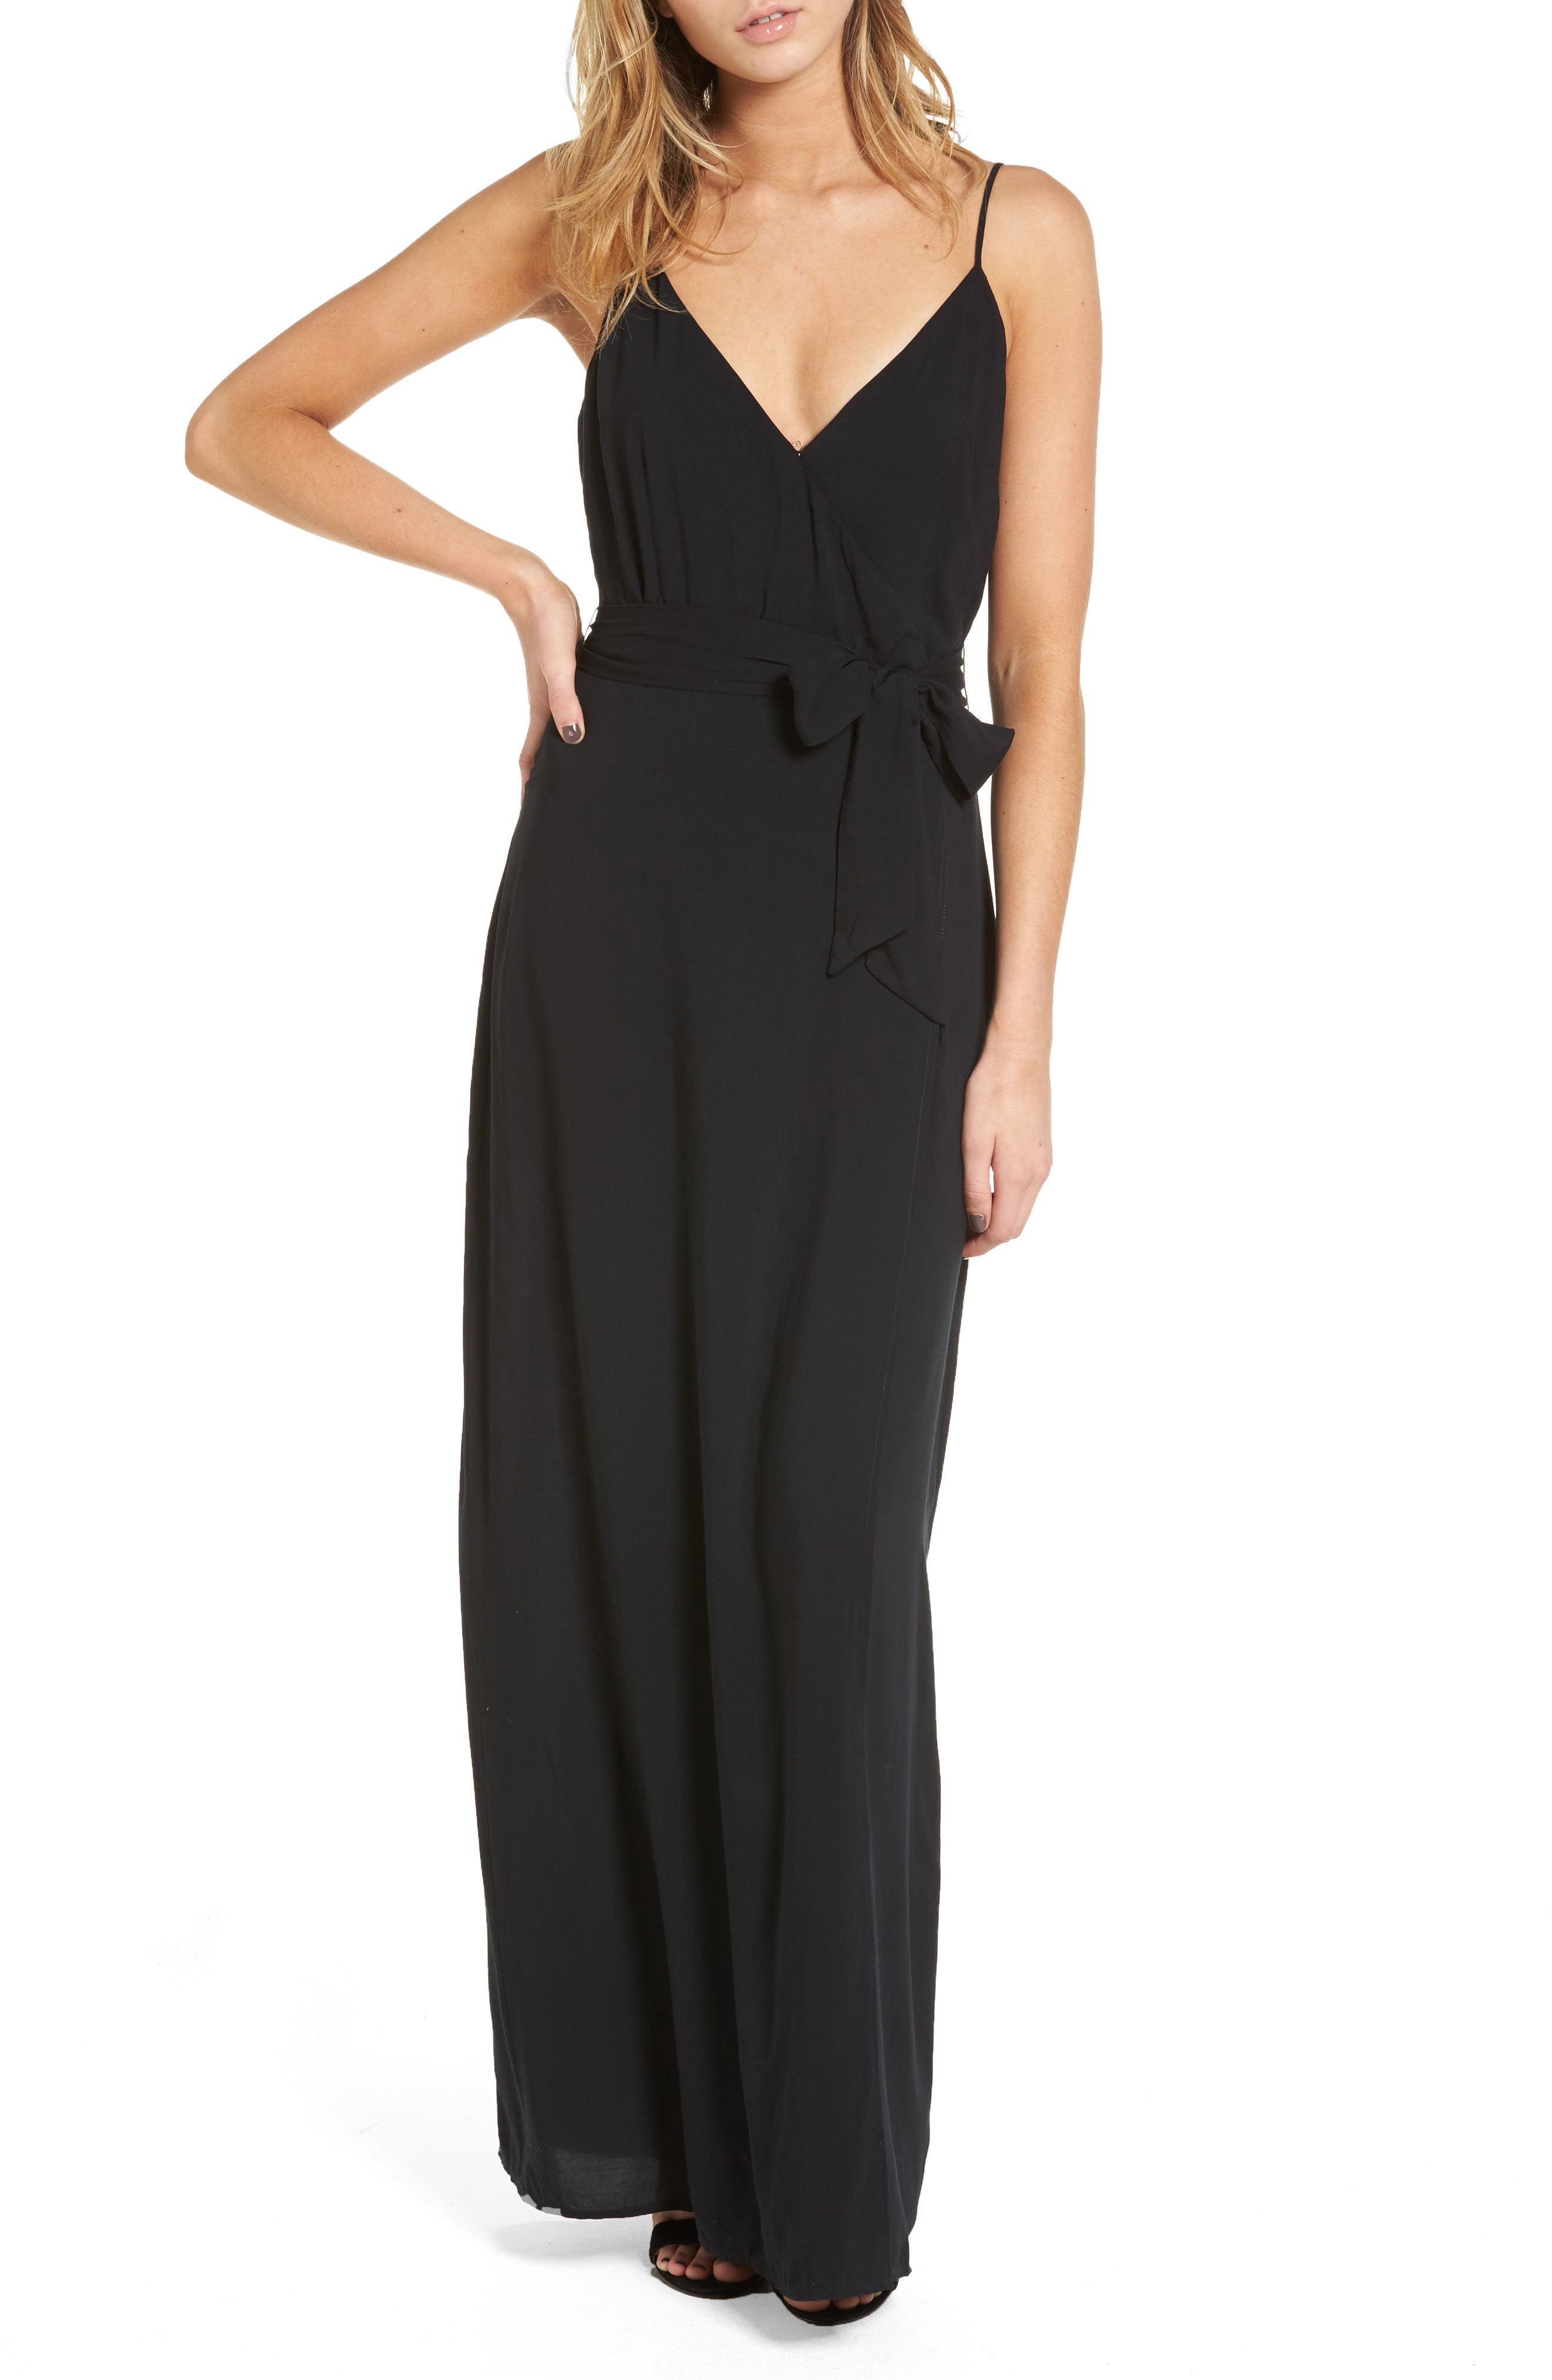 PAIGE Regina Maxi Dress